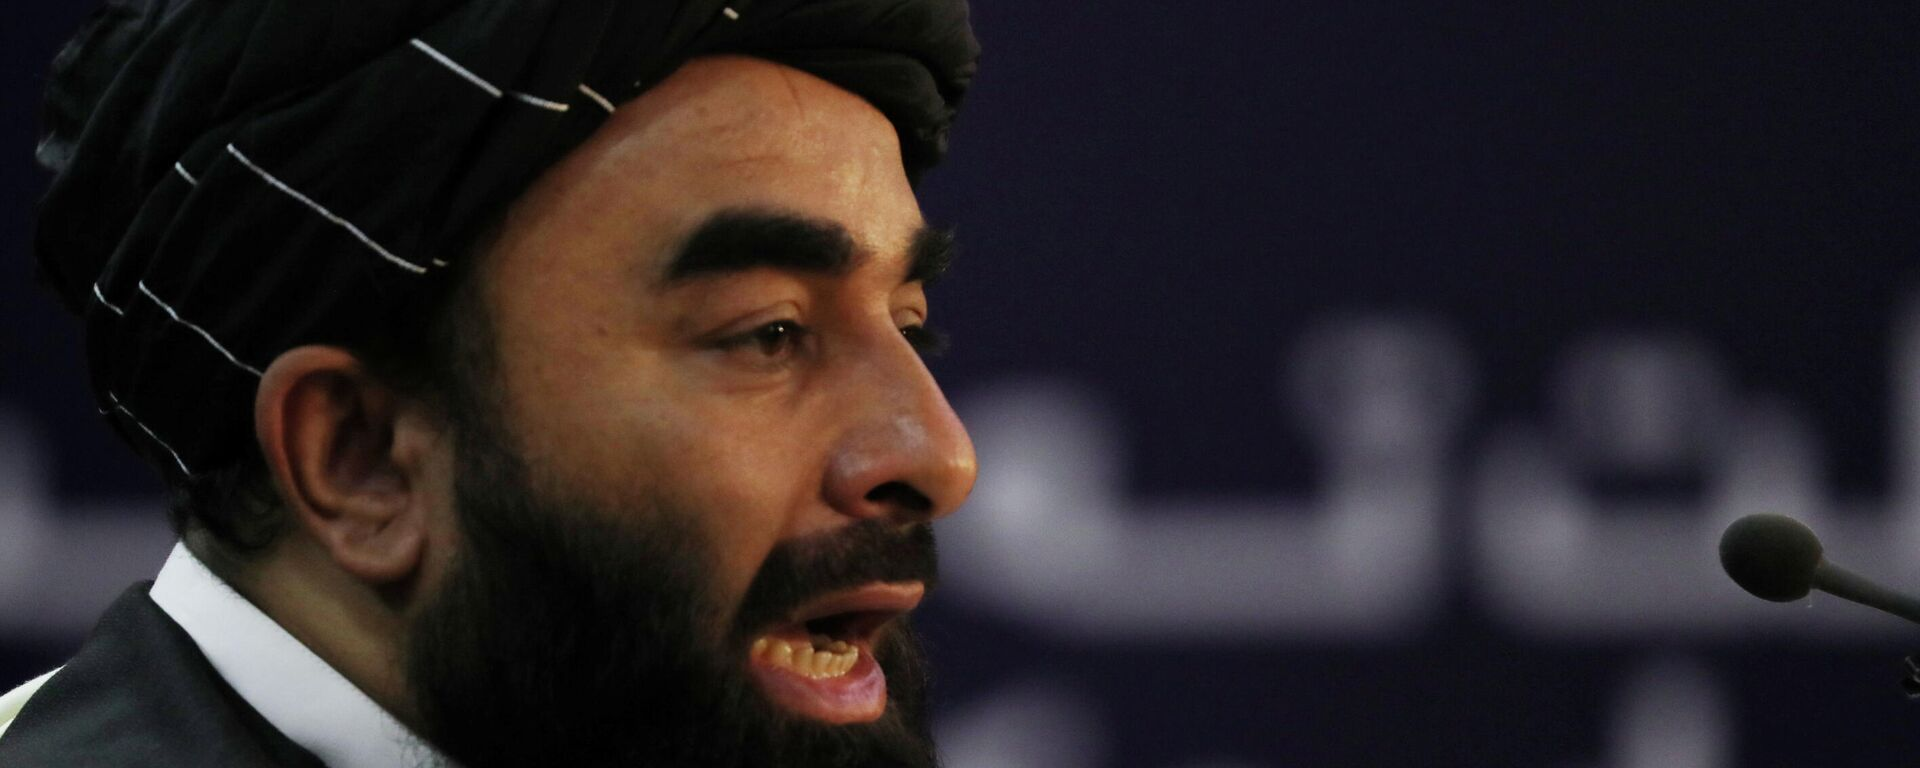 Taliban spokesman Zabihullah Mujahid speaks during a news conference in Kabul, Afghanistan September 6, 2021 - Sputnik International, 1920, 21.09.2021